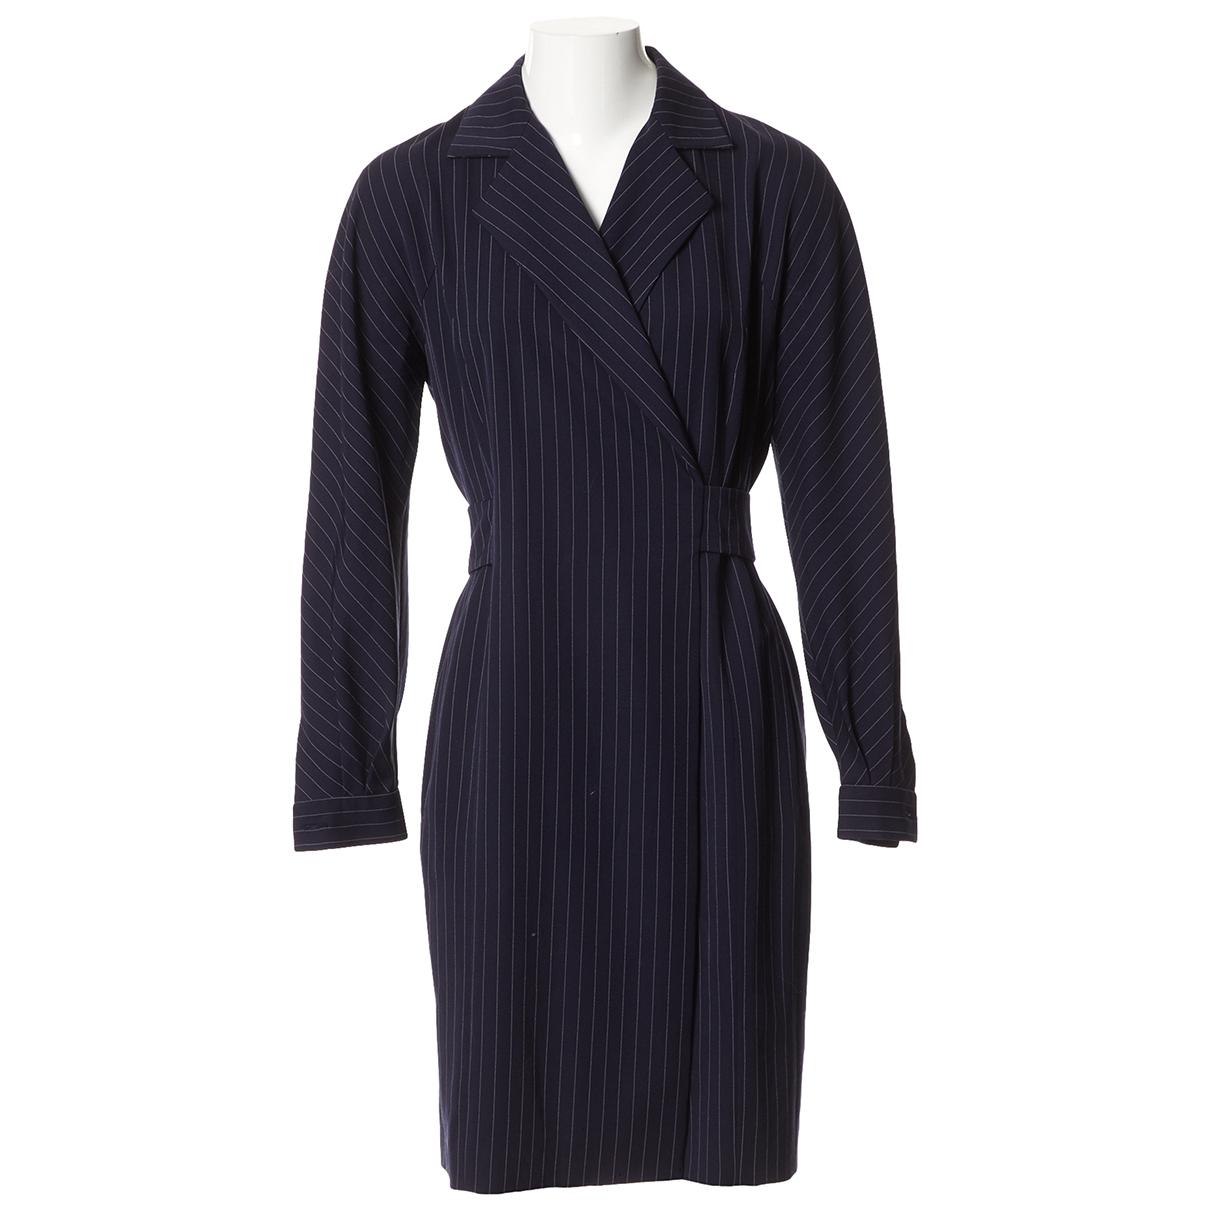 Dior \N Navy Wool jacket for Women 44 FR